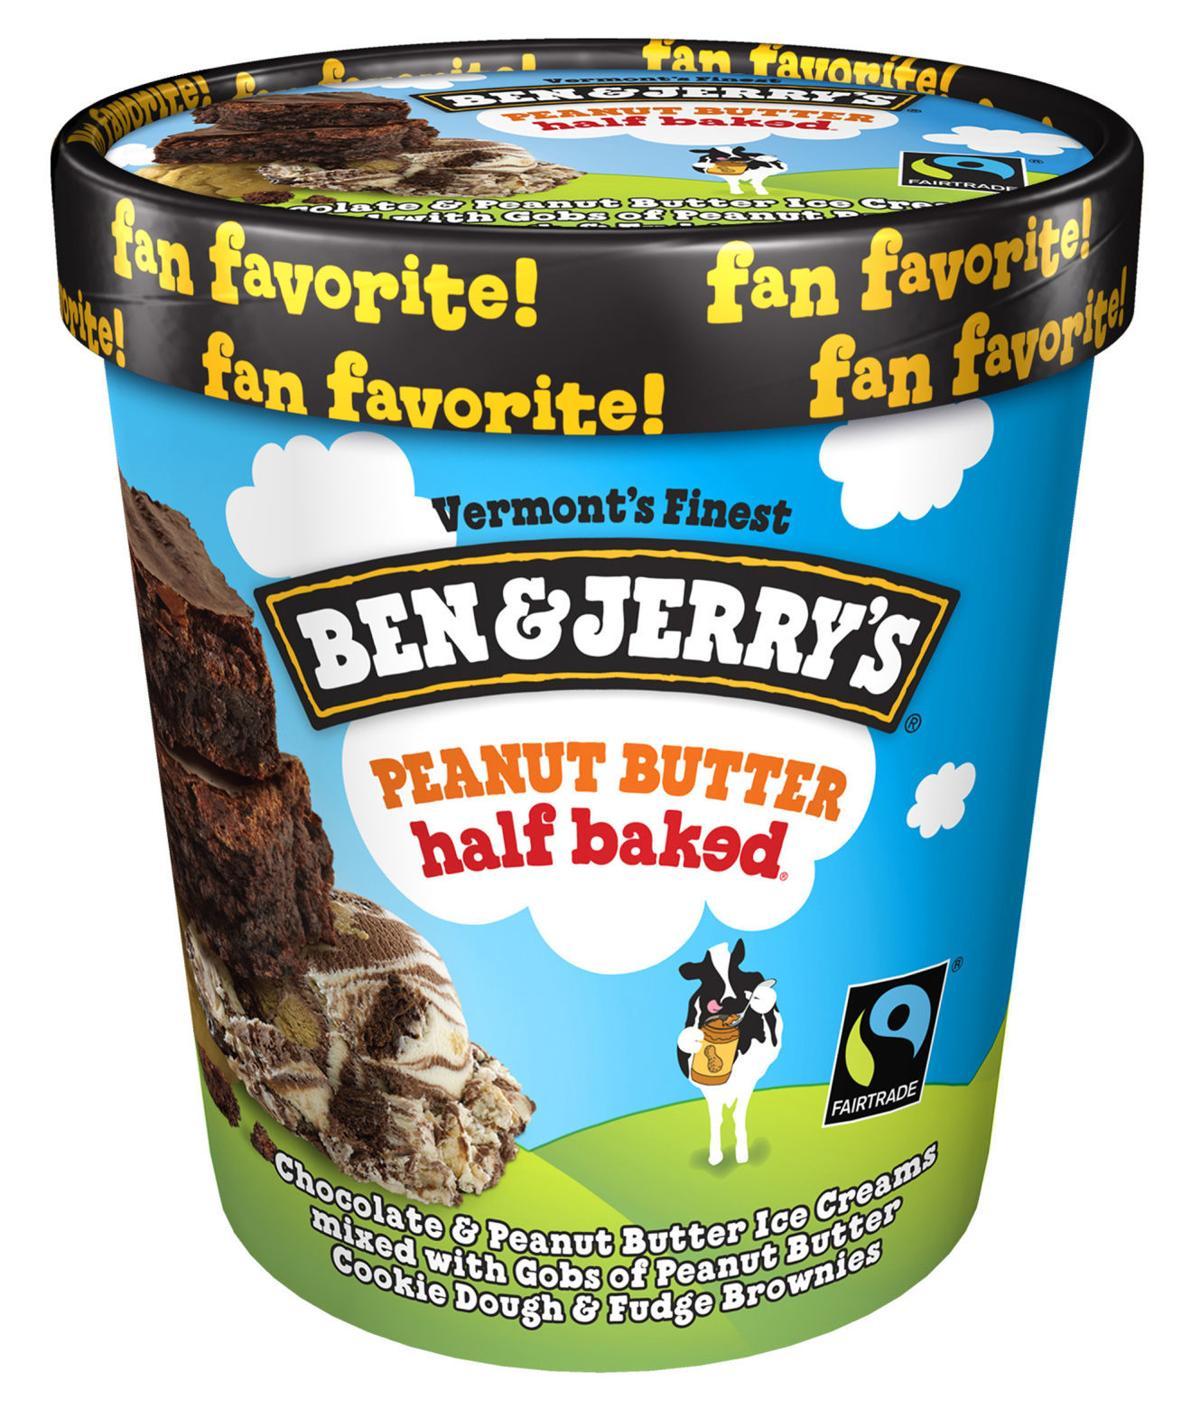 FOOD-BENJERRYS-ICECREAM-RANKINGS-1-MCT